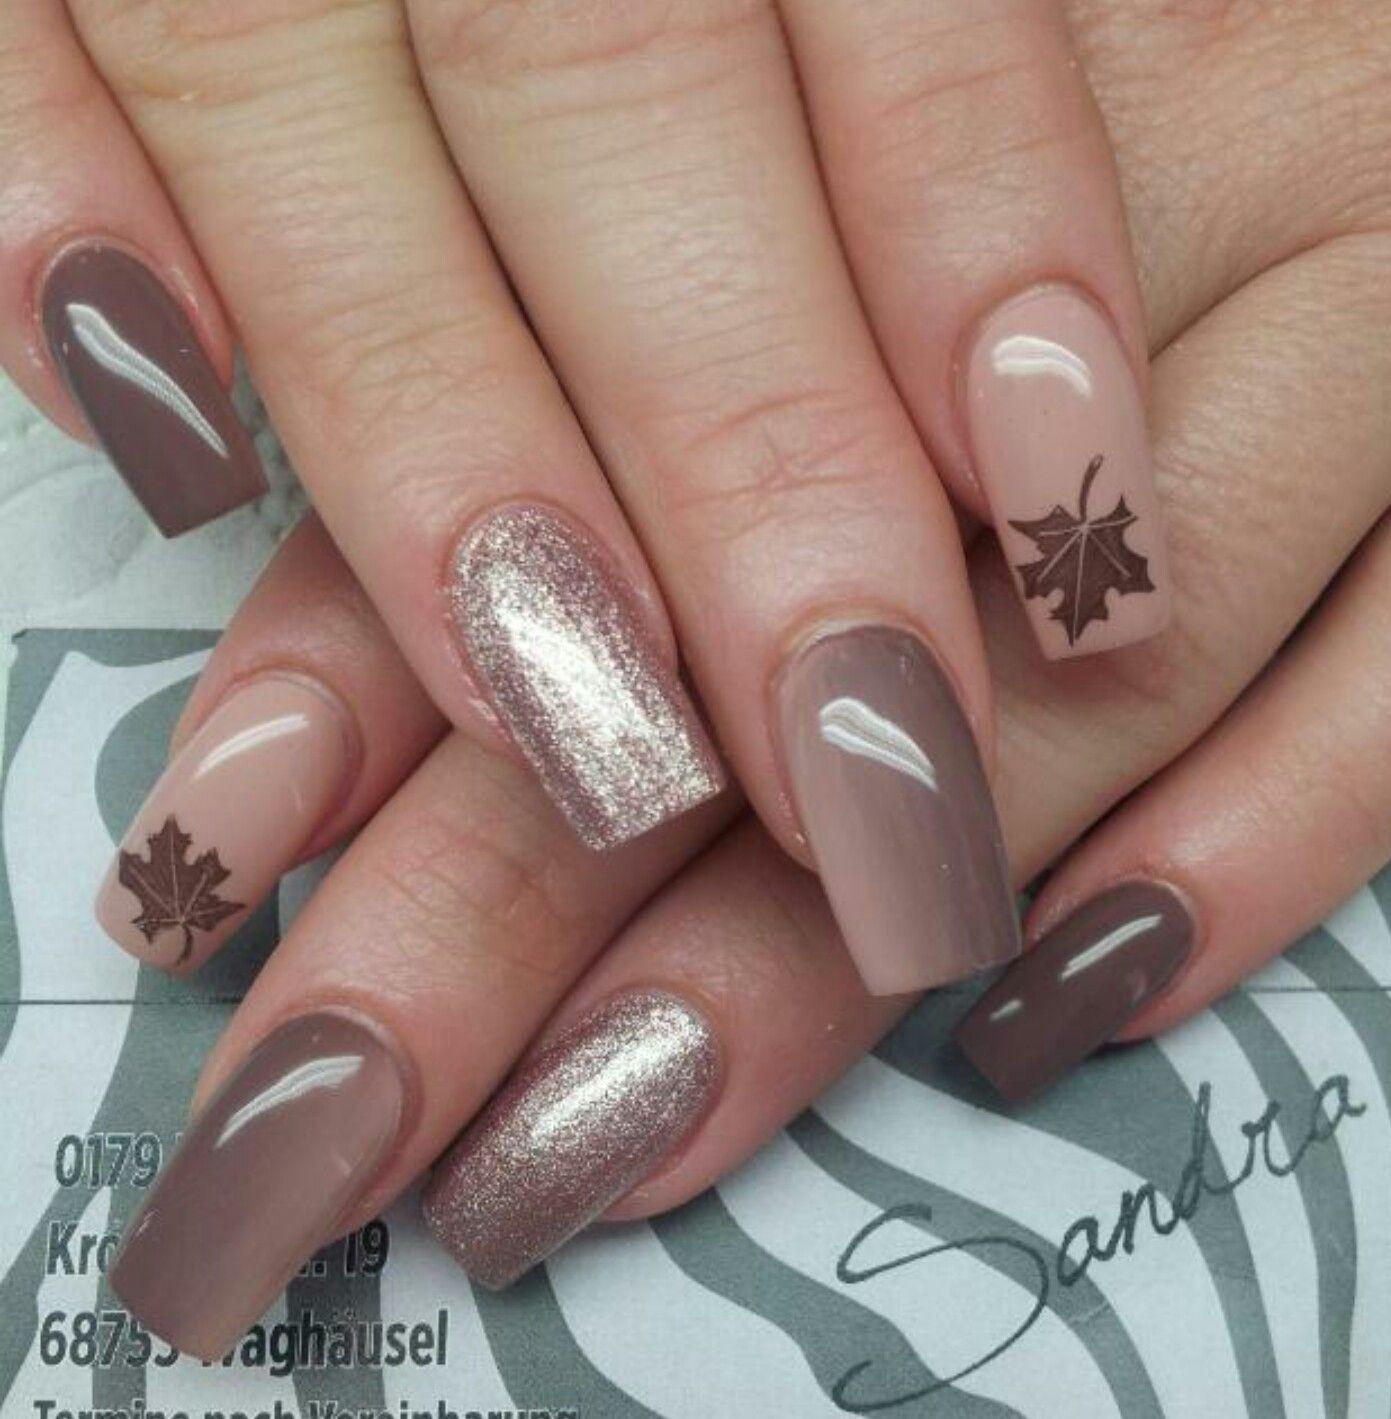 Nageldesign Herbstfarben  Nude Braun Herbst Nägel Pinterest